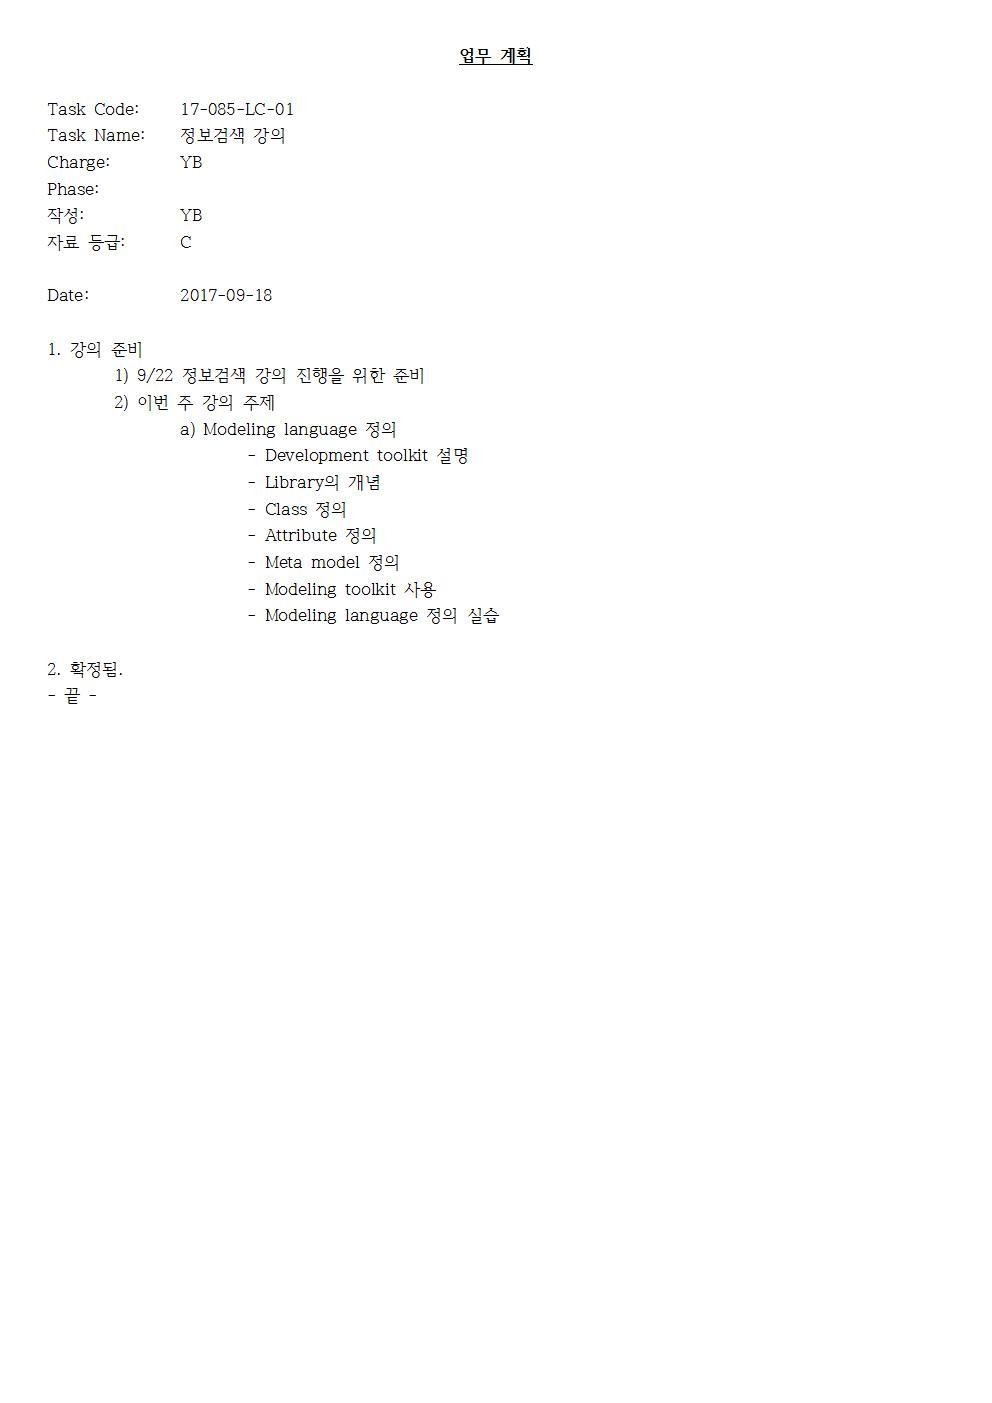 D-[17-085-LC-01] 정보검색 강의-2017-09-12001.jpg